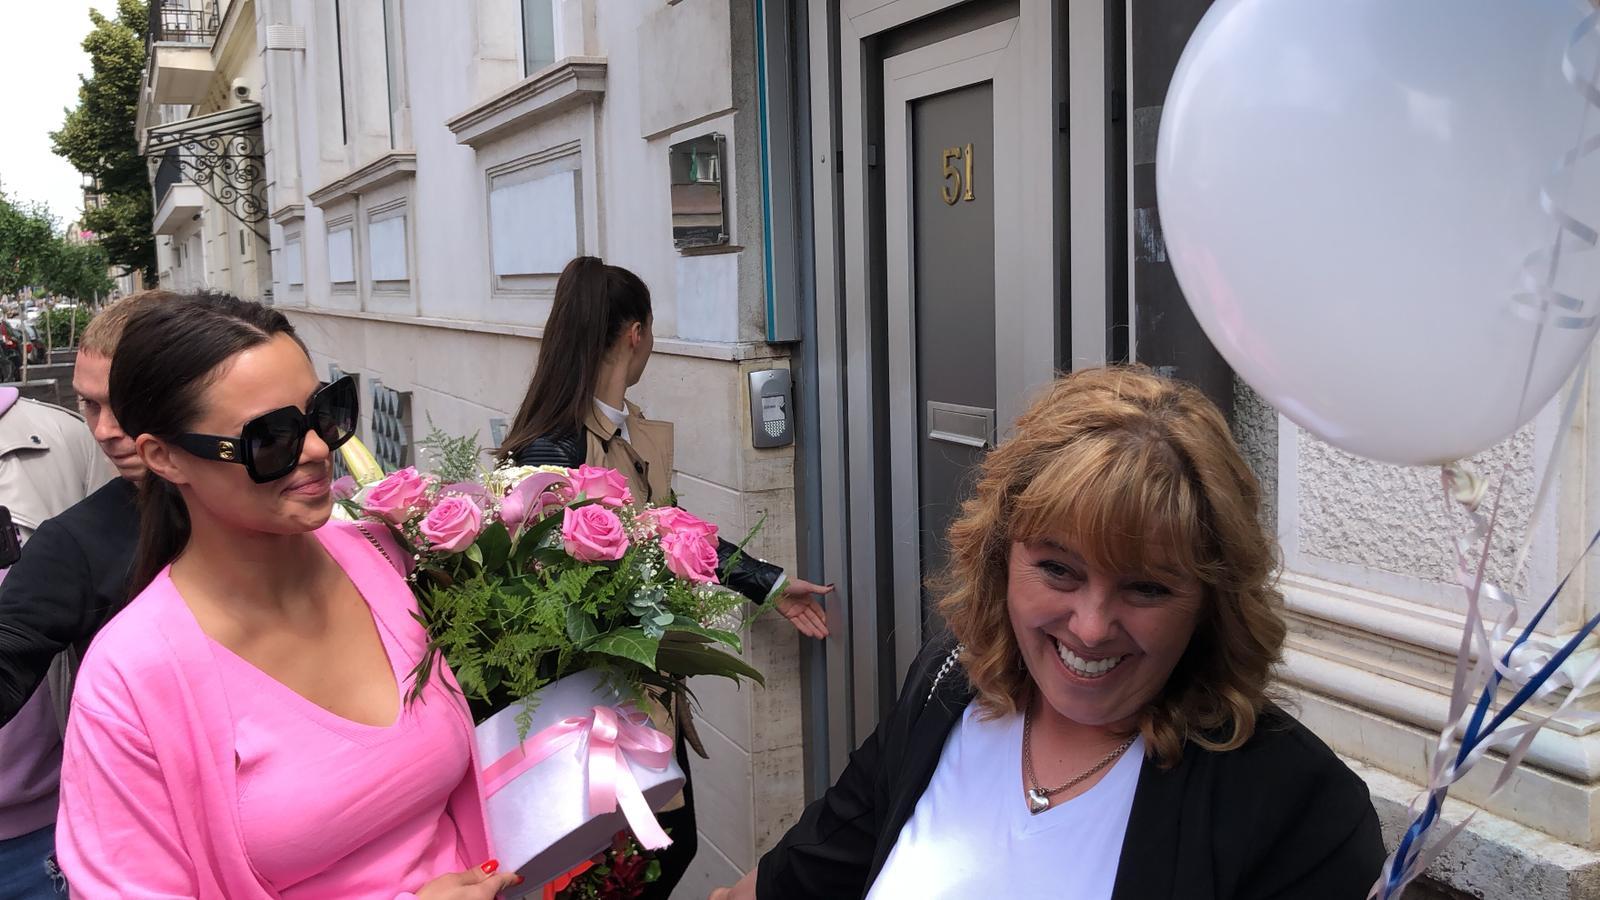 Prva fotografija ispred sale u porodilištu: Bogdanine sestre i majka videle bebu (VIDEO)